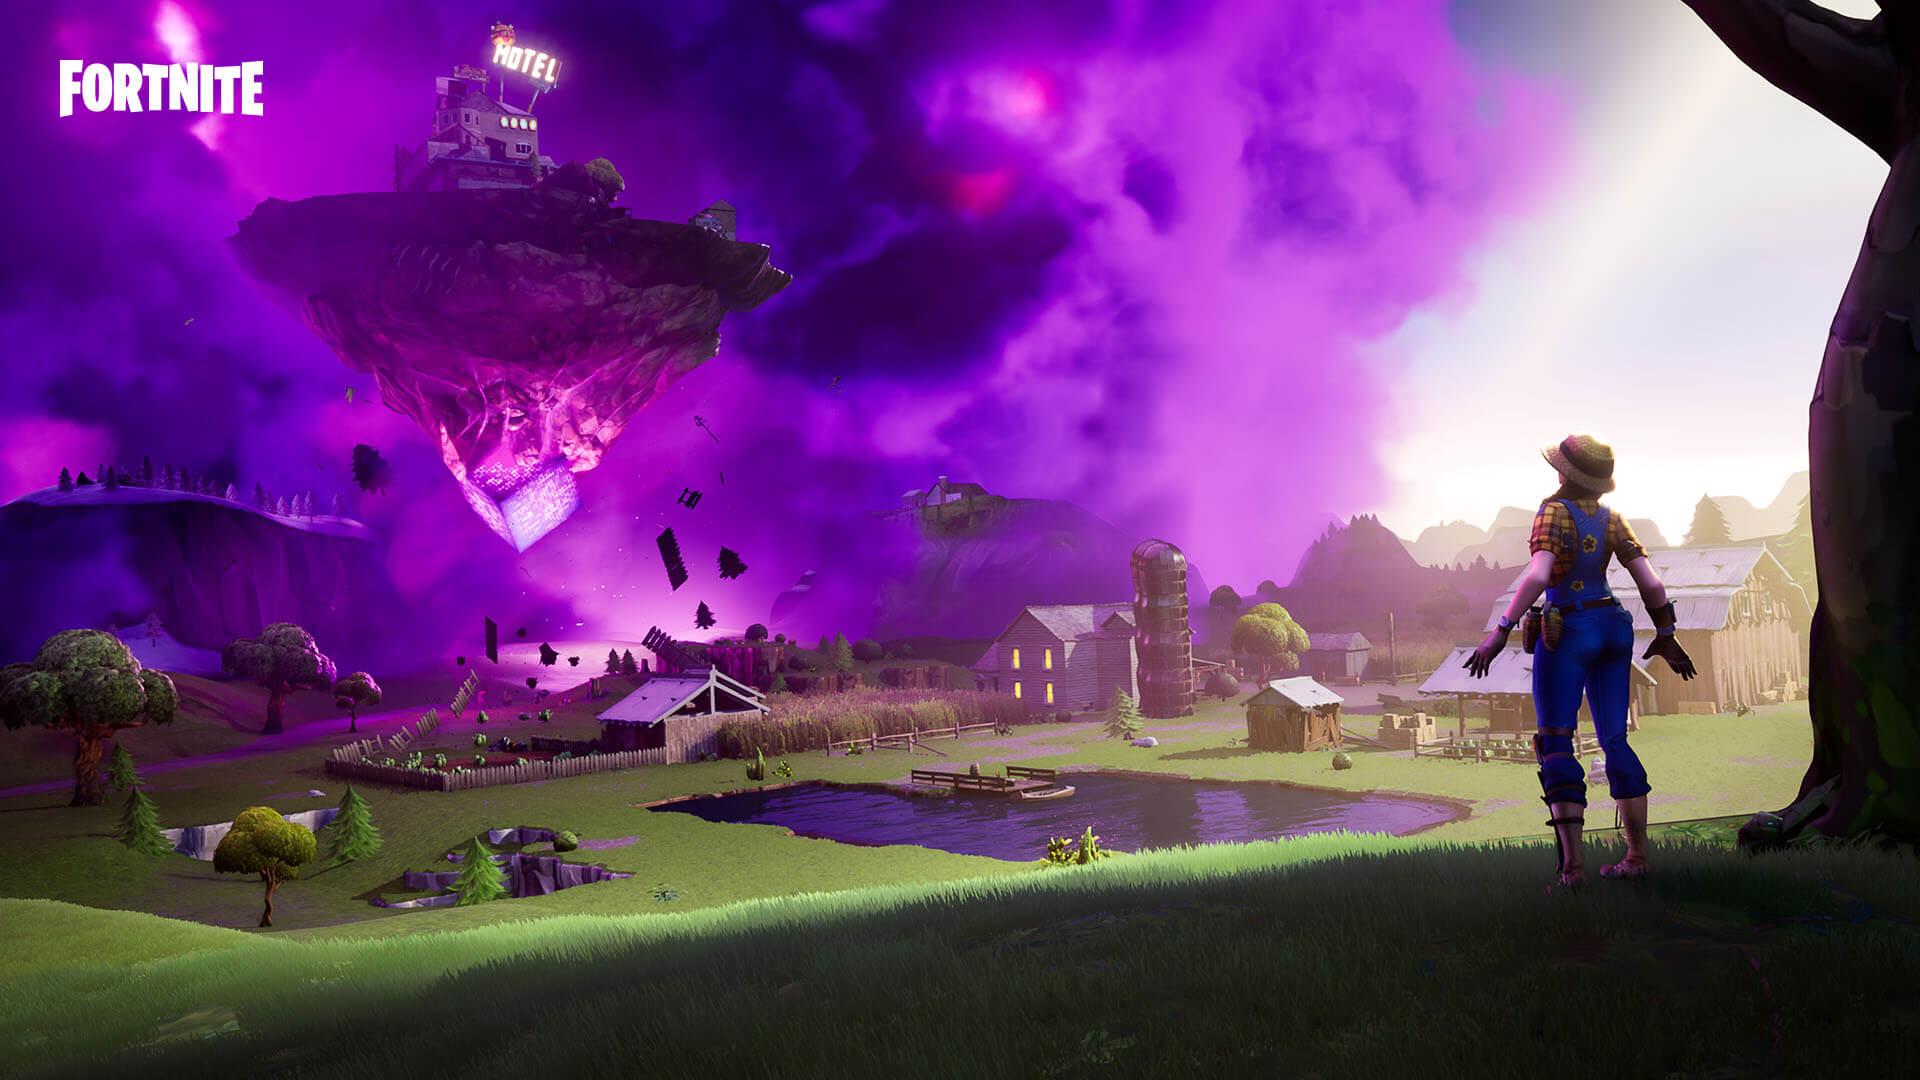 Fortnite v10.20 Content Update